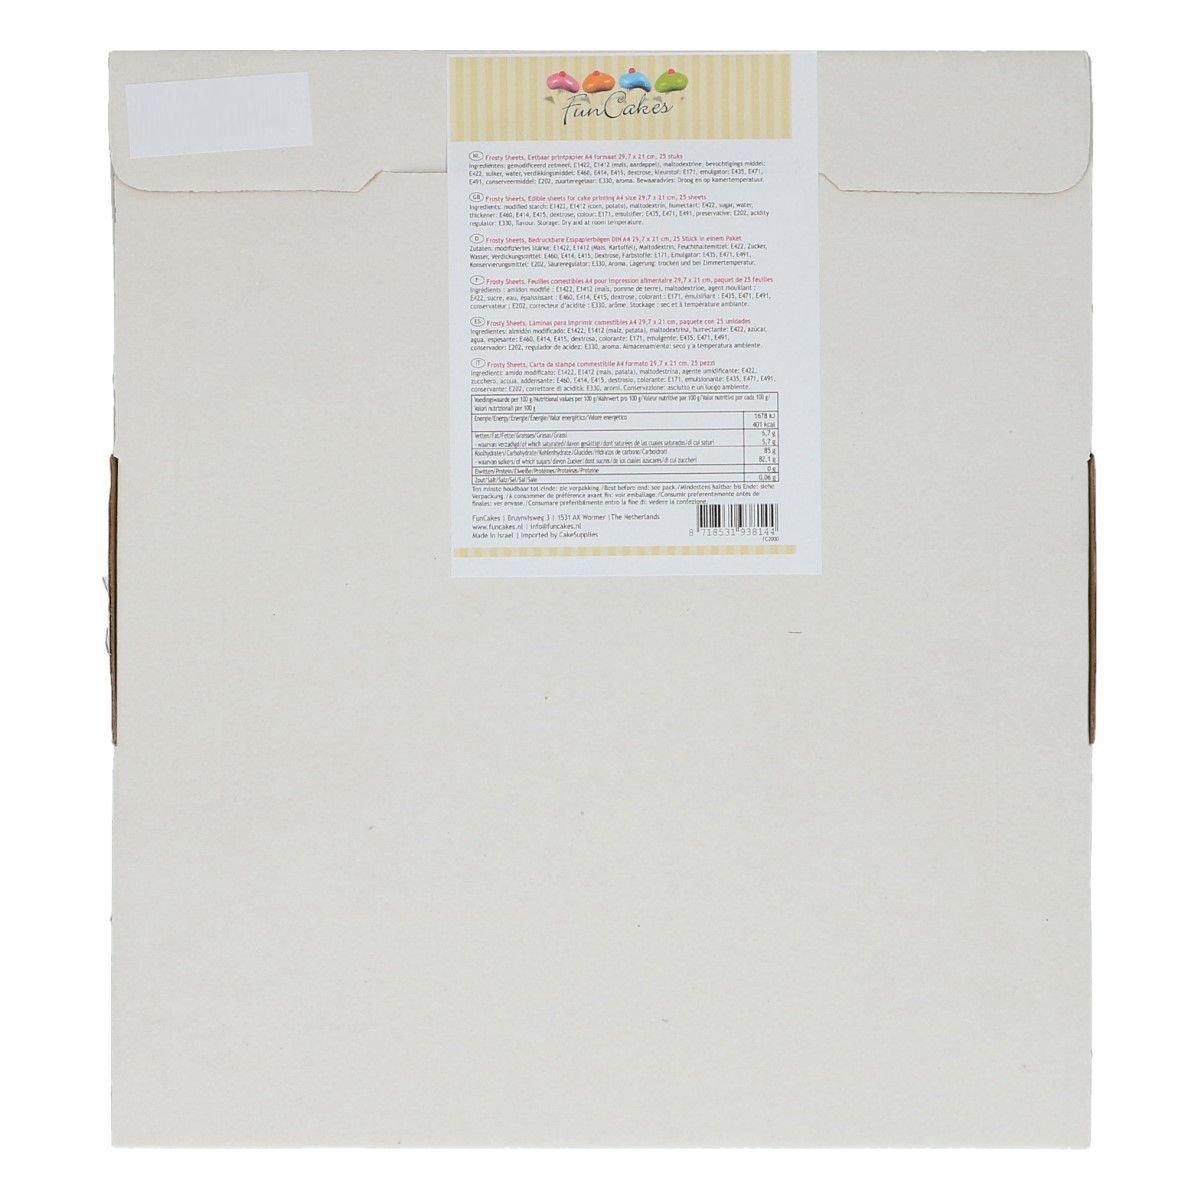 FunCakes - Frosty A4 Sheets 25pcs - Βρώσιμα Φύλλα Ζαχαρόπαστας Α4 για Εκτύπωση - 25 φύλλα - 29.7x21εκ